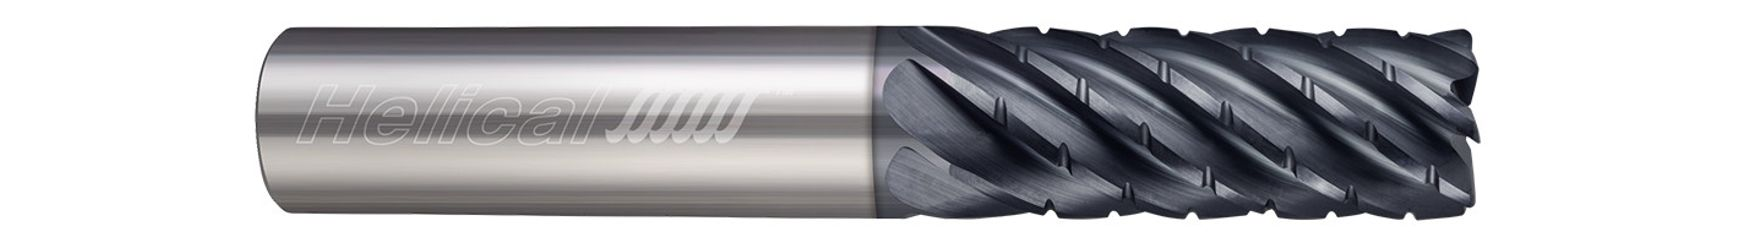 tool-details-59424